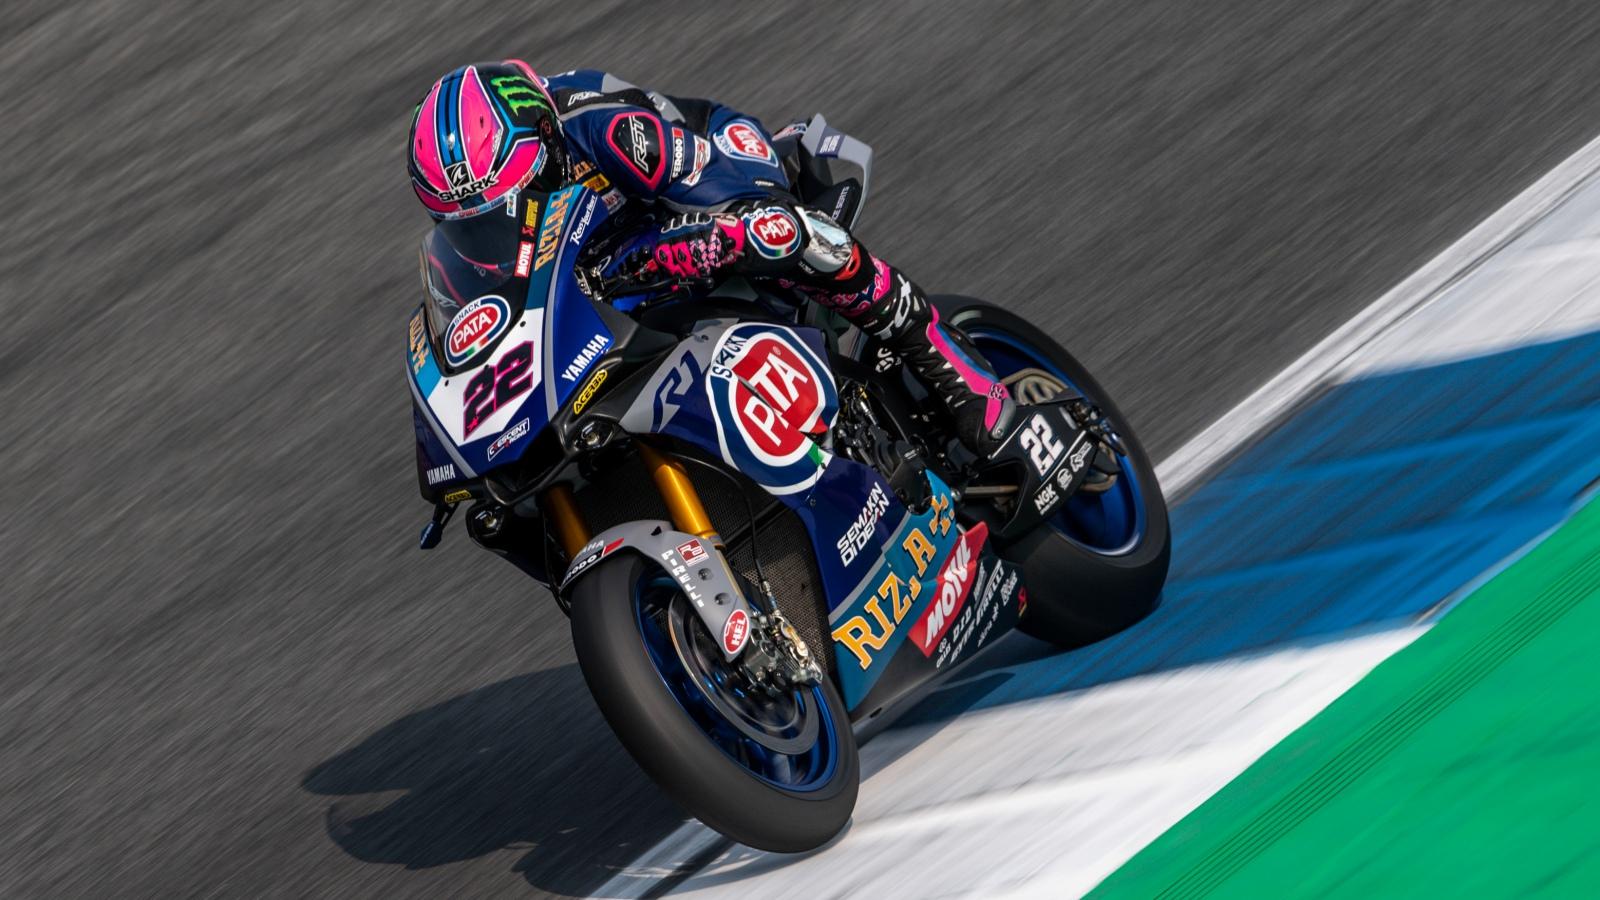 Kawasaki ficha a Alex Lowes para el Mundial de Superbike 2020